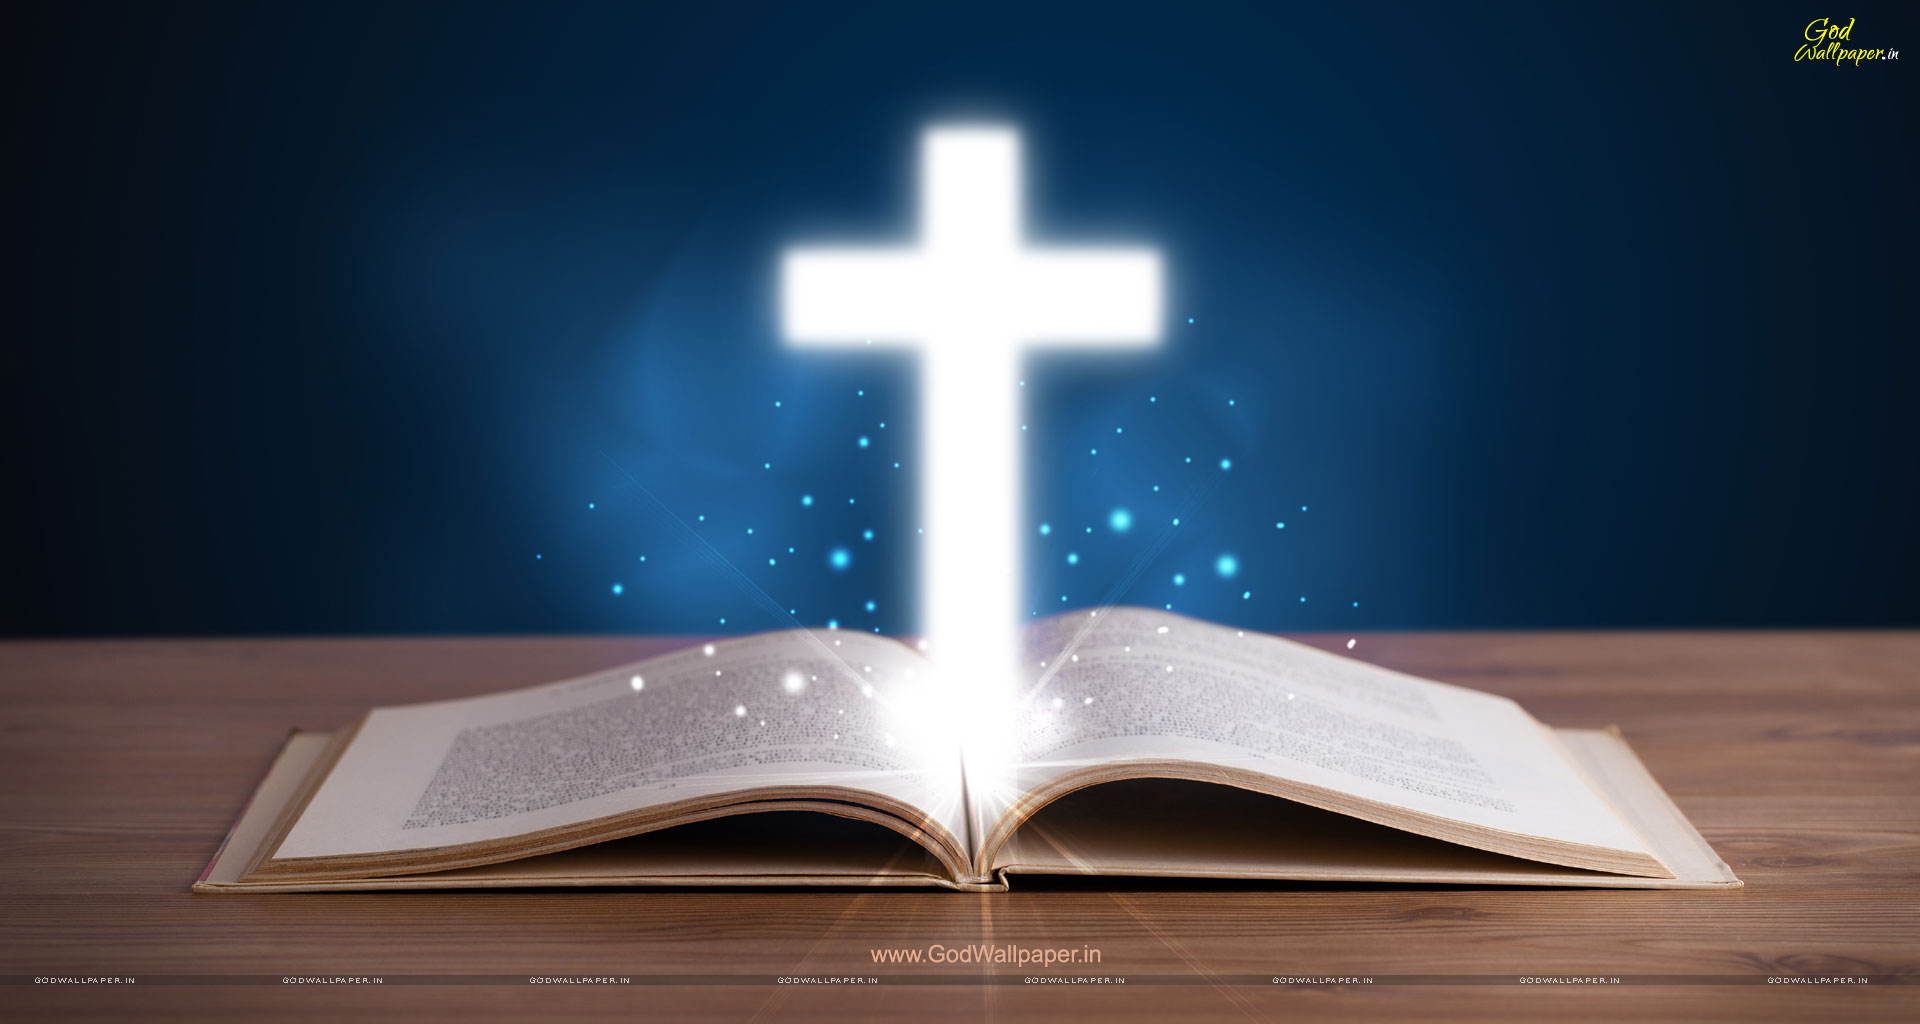 jesus christ widescreen wallpapers - photo #28